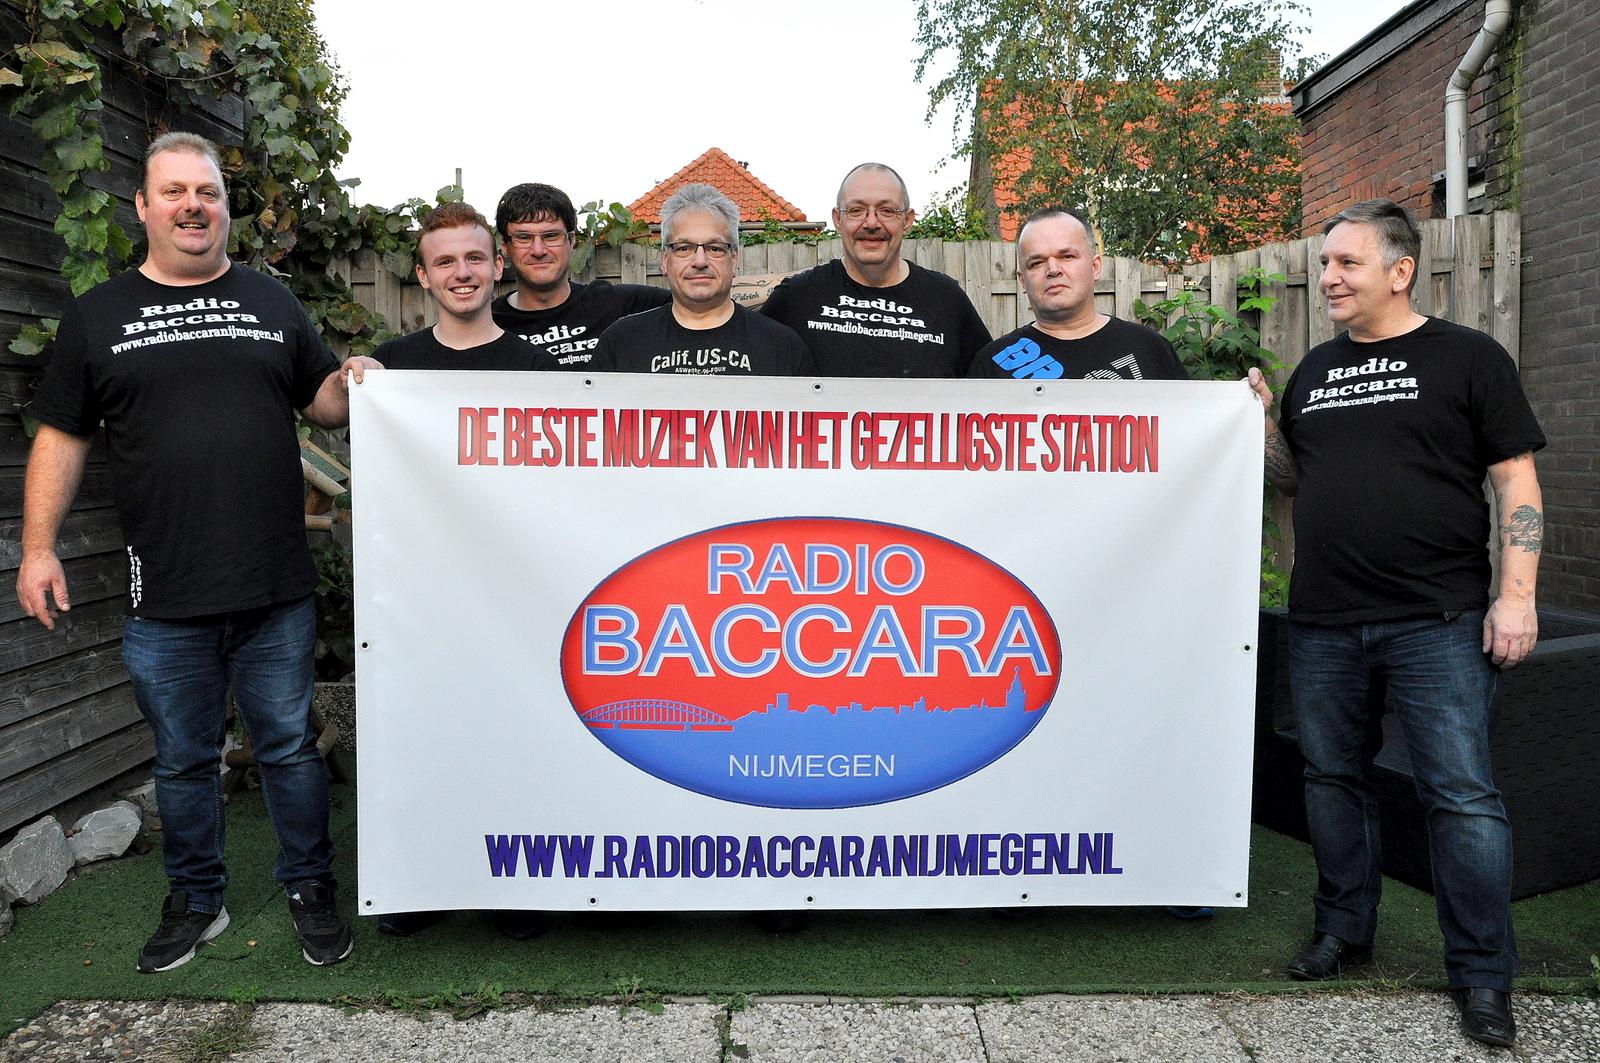 Piraat Radio Baccara